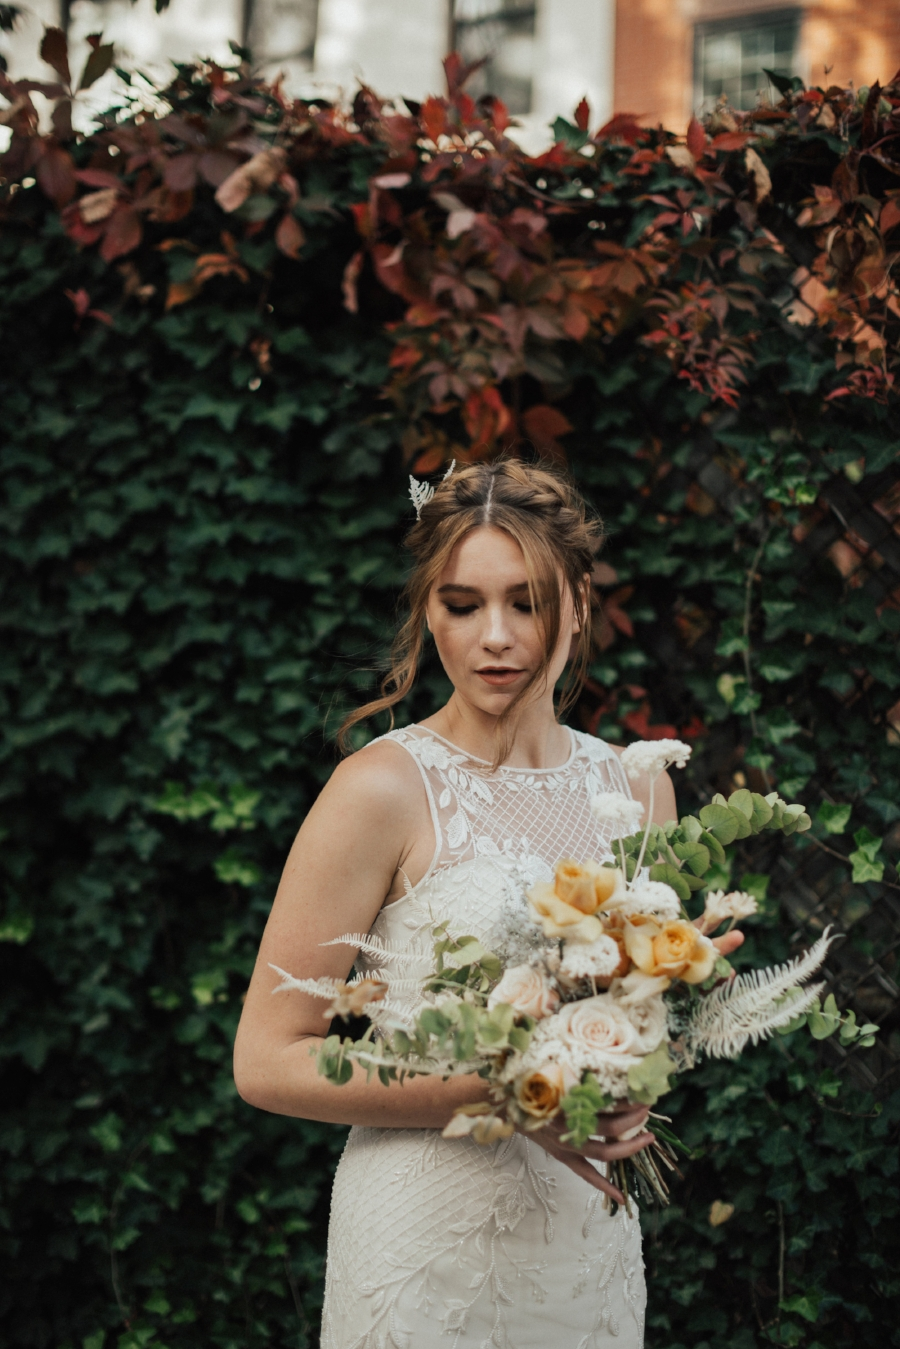 ivory-and-beau-bridal-boutique-marina-semone-trunk-show-marina-semone-wedding-gowns-vintage-inspired-wedding-gownsivory-and-beau-bridal-boutique-marina-semone-trunk-show-marina-semone-wedding-gowns-vintage-inspired-wedding-gowns-4.jpg